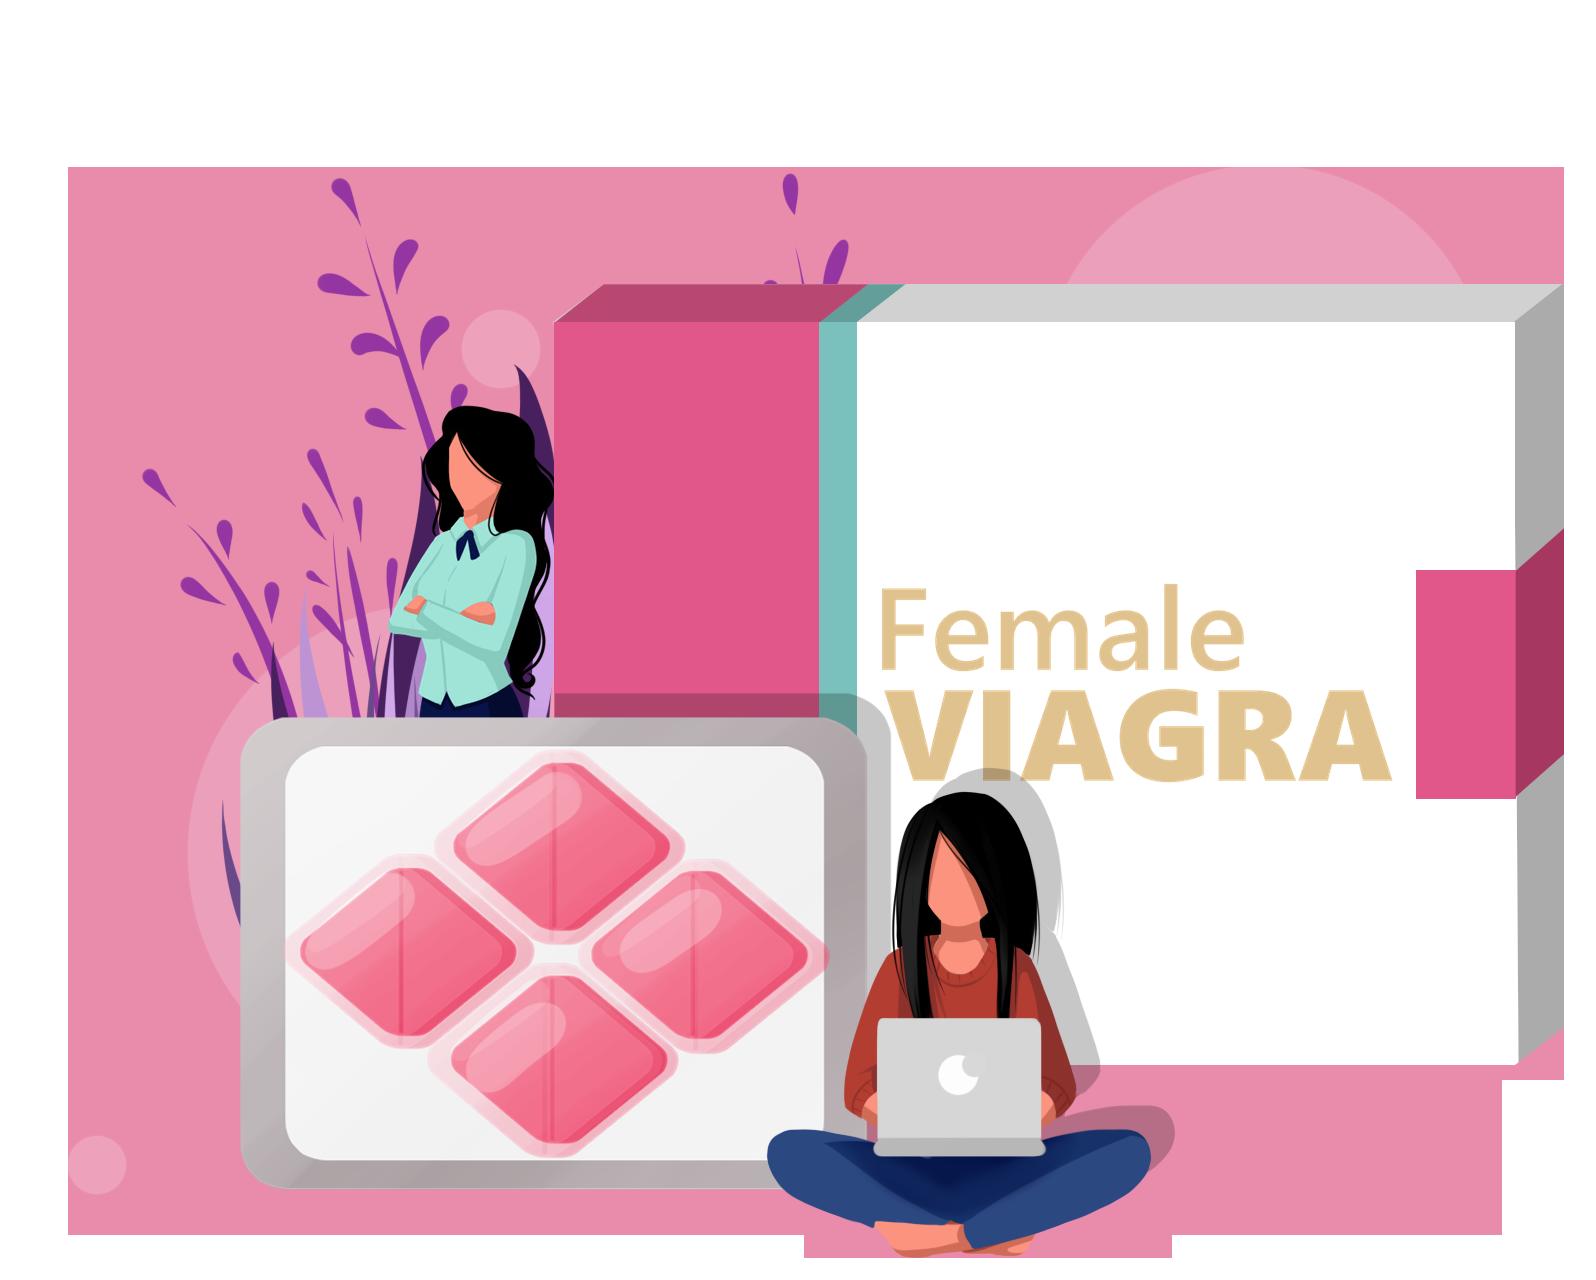 Female Viagra Pill Guide